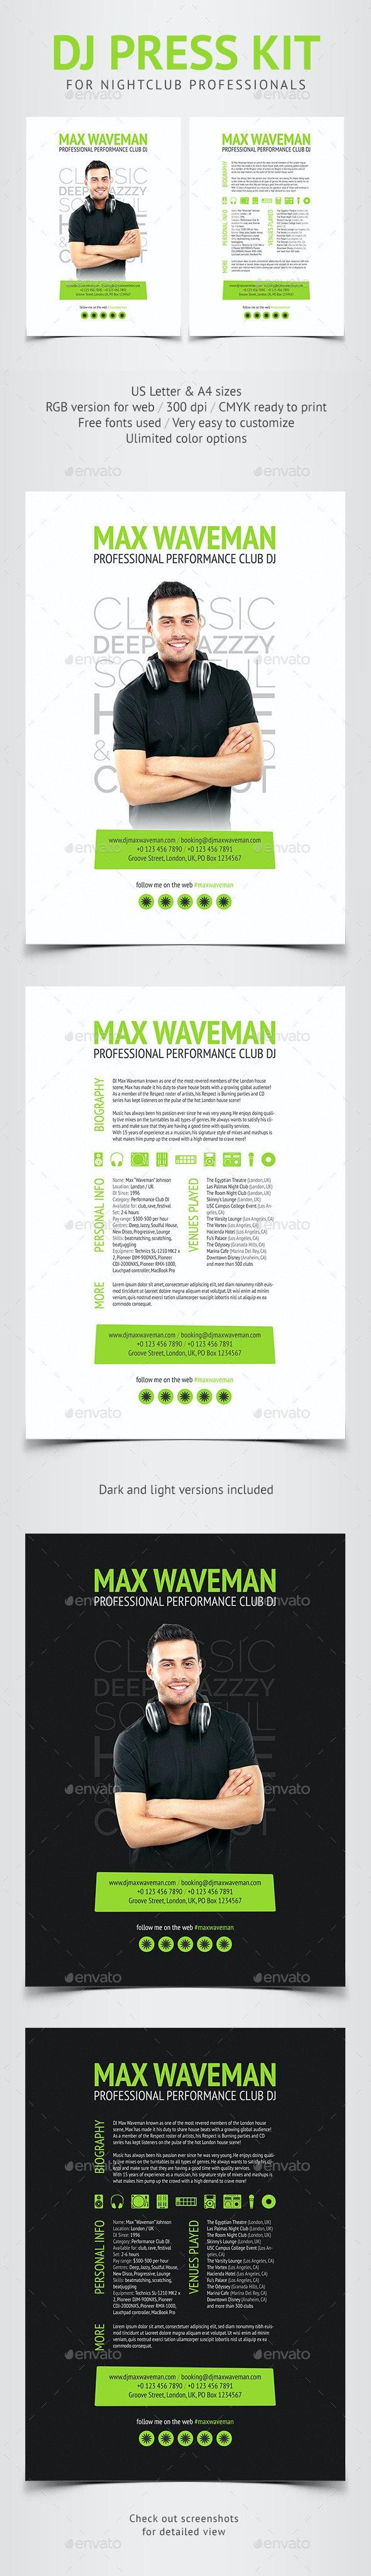 Groove - DJ Press Kit / Resume PSD Template - Resumes Stationery